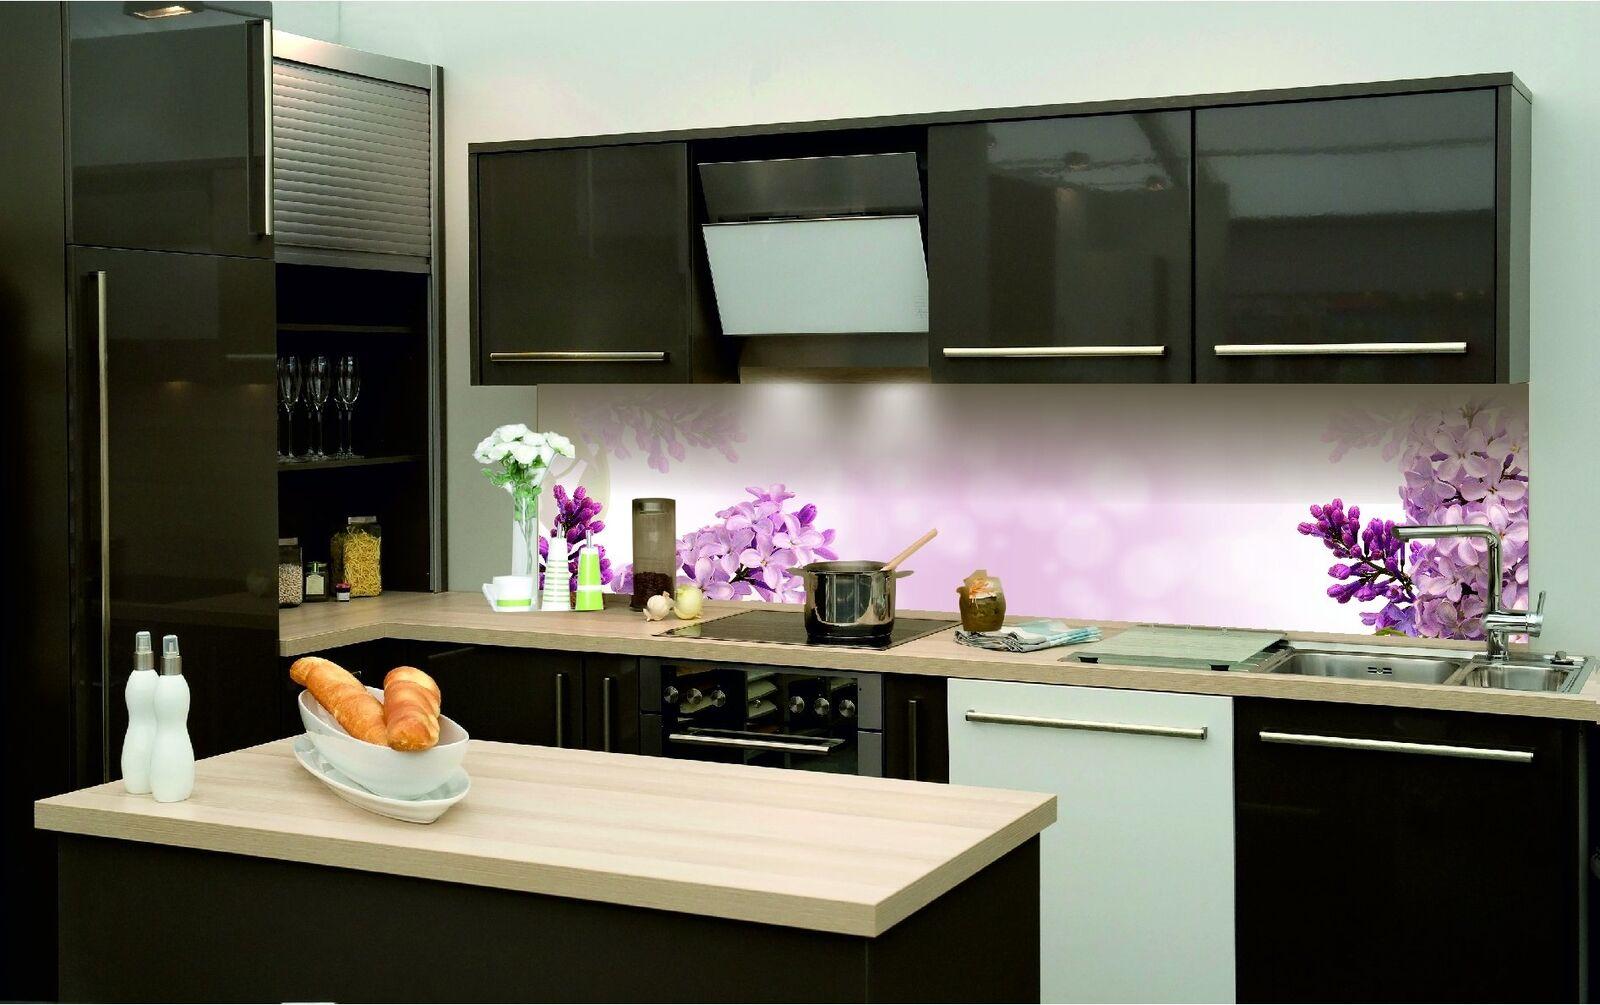 Cocina plano posterior lámina autoadhesiva púrpuras flores kfs186